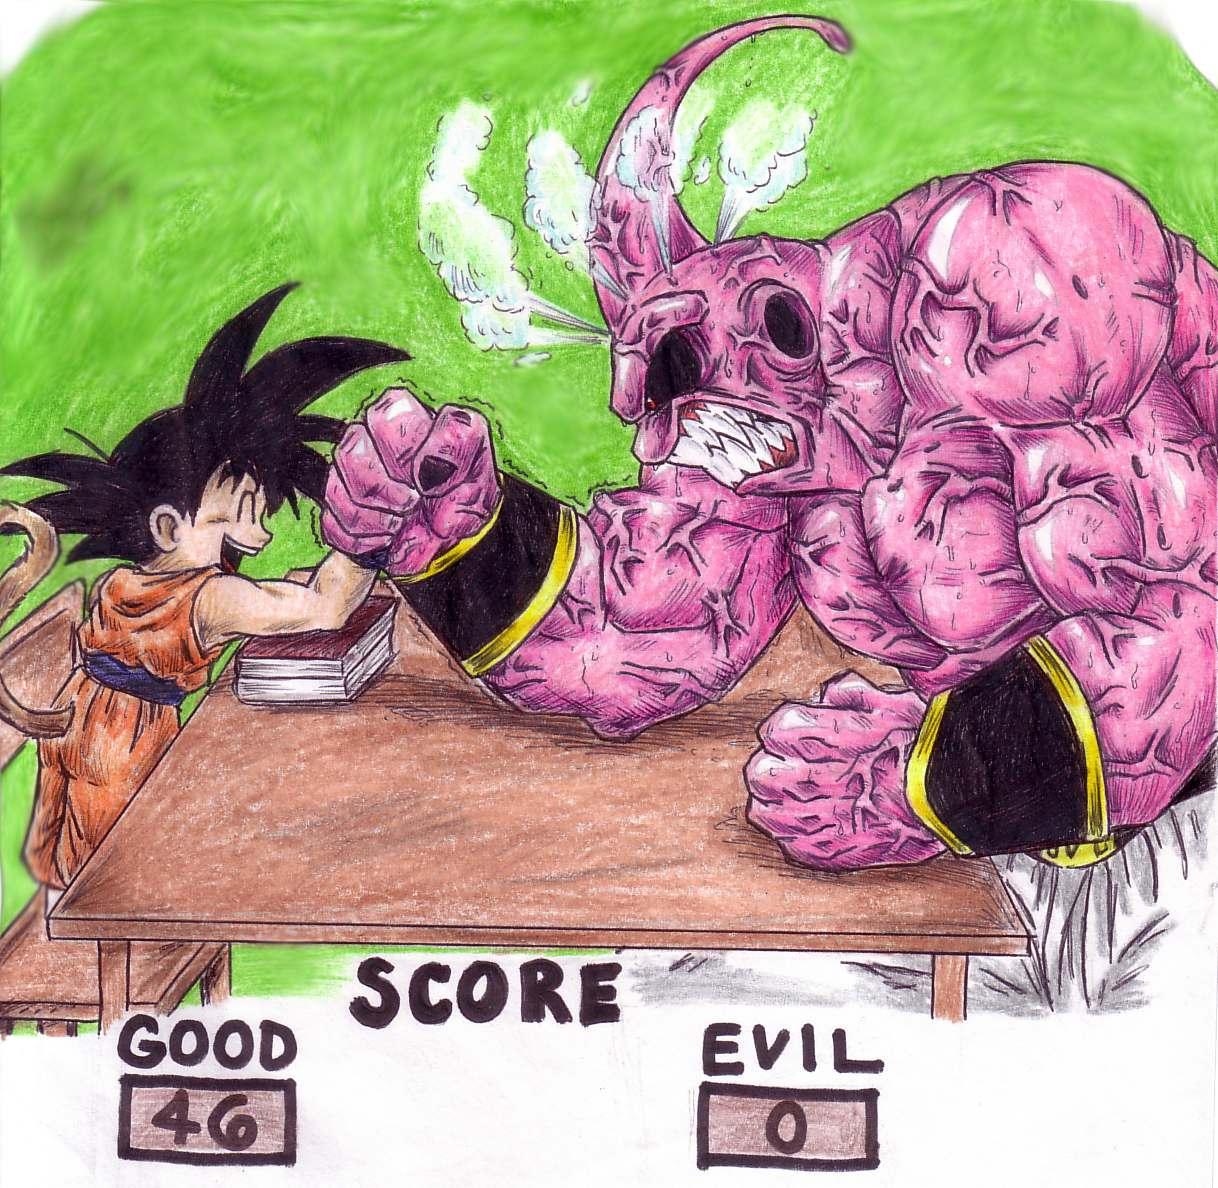 Personajes likewise 375276581433914894 in addition Goku Vs Buu 13666996 also Son Goku Half Ssj4 198449105 likewise Zpics. on goku thumbs up